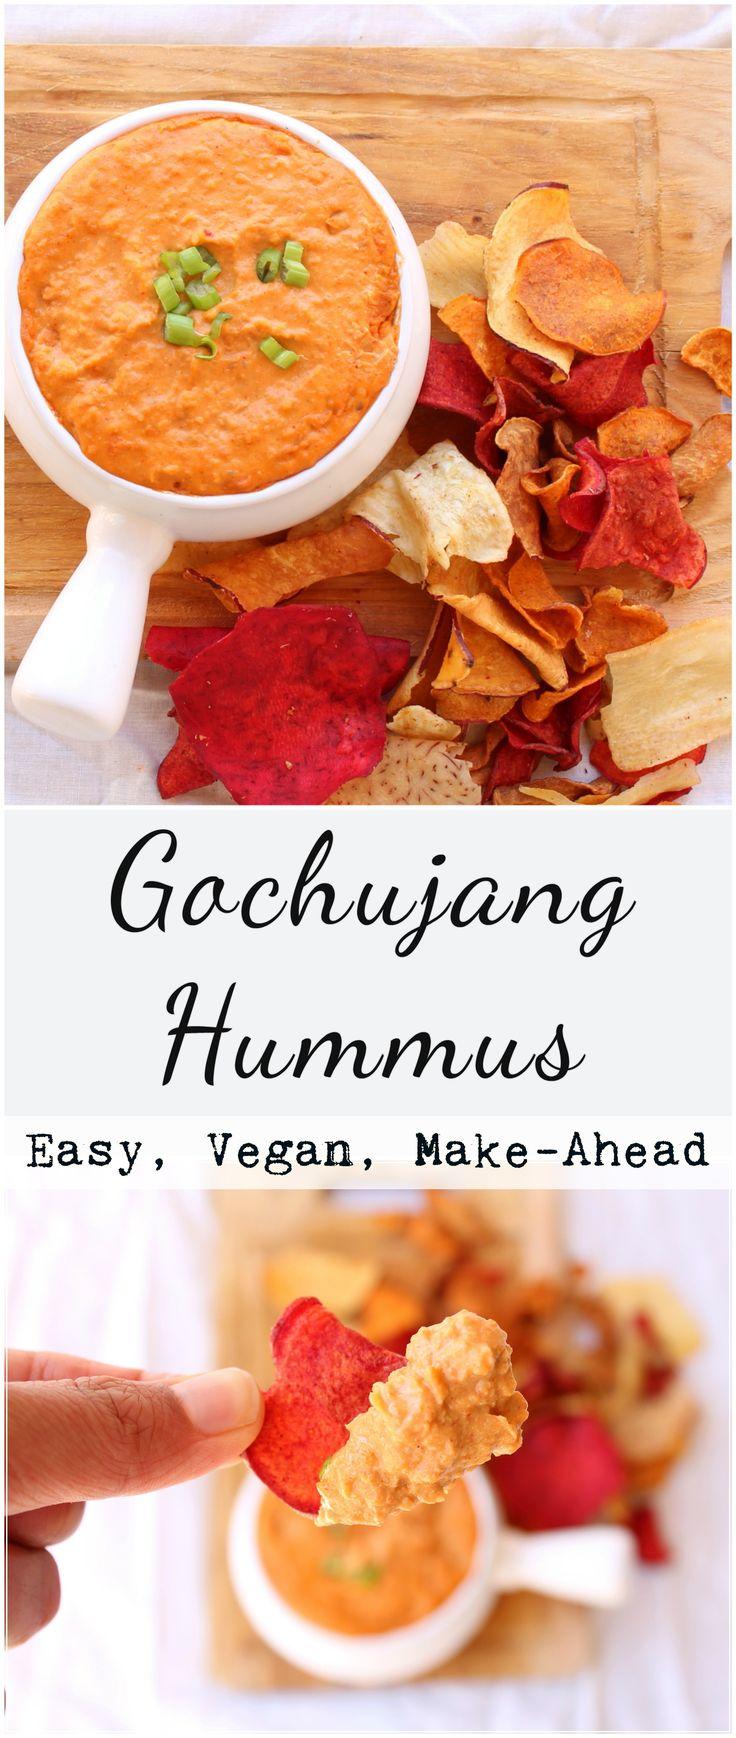 236 best korean eats images on pinterest korean food recipes gochujang hummus forumfinder Gallery